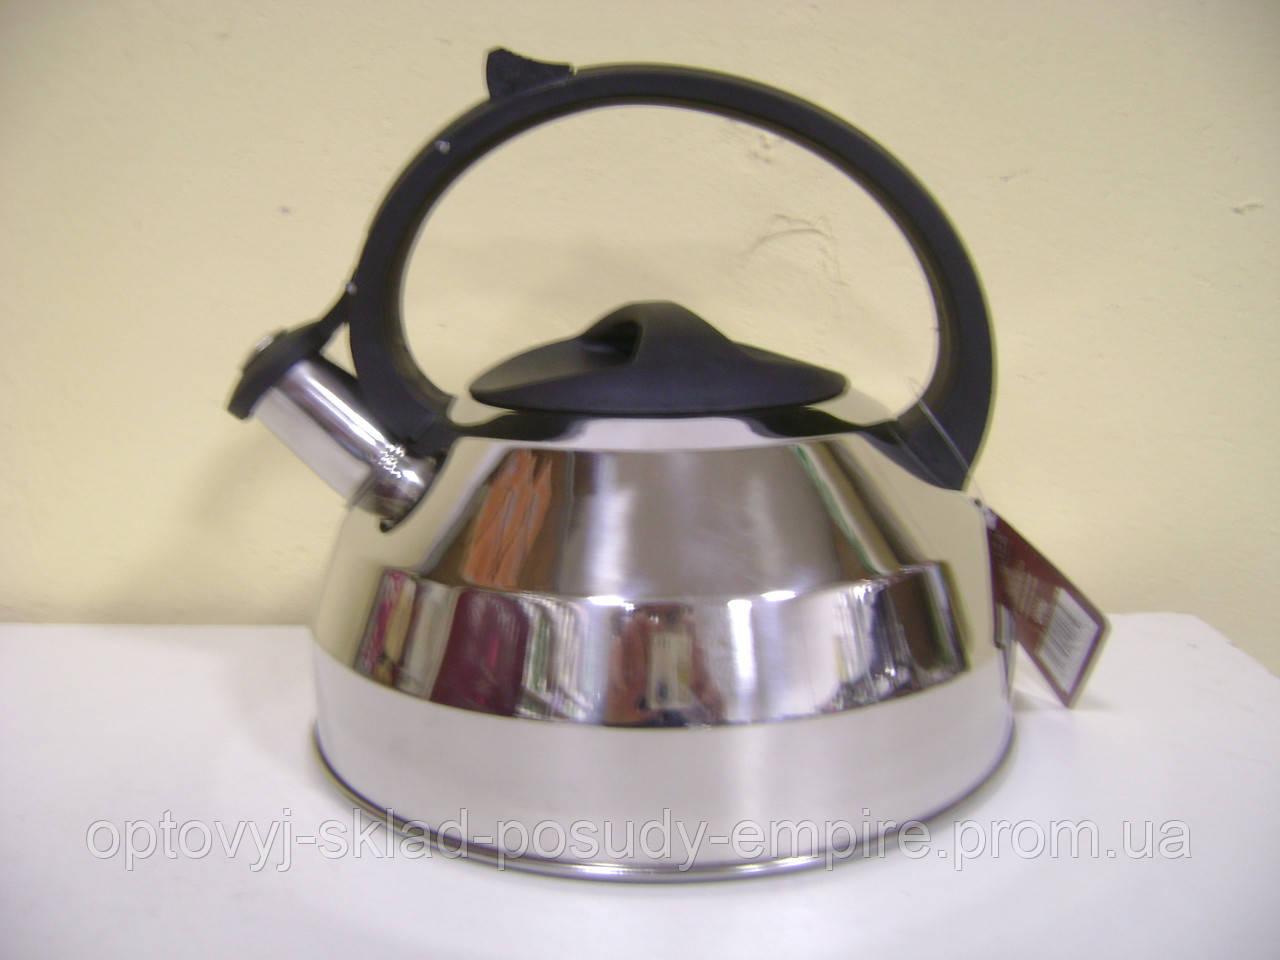 Чайник нержавеющий со свистком 49504 LESSNER 2,7л